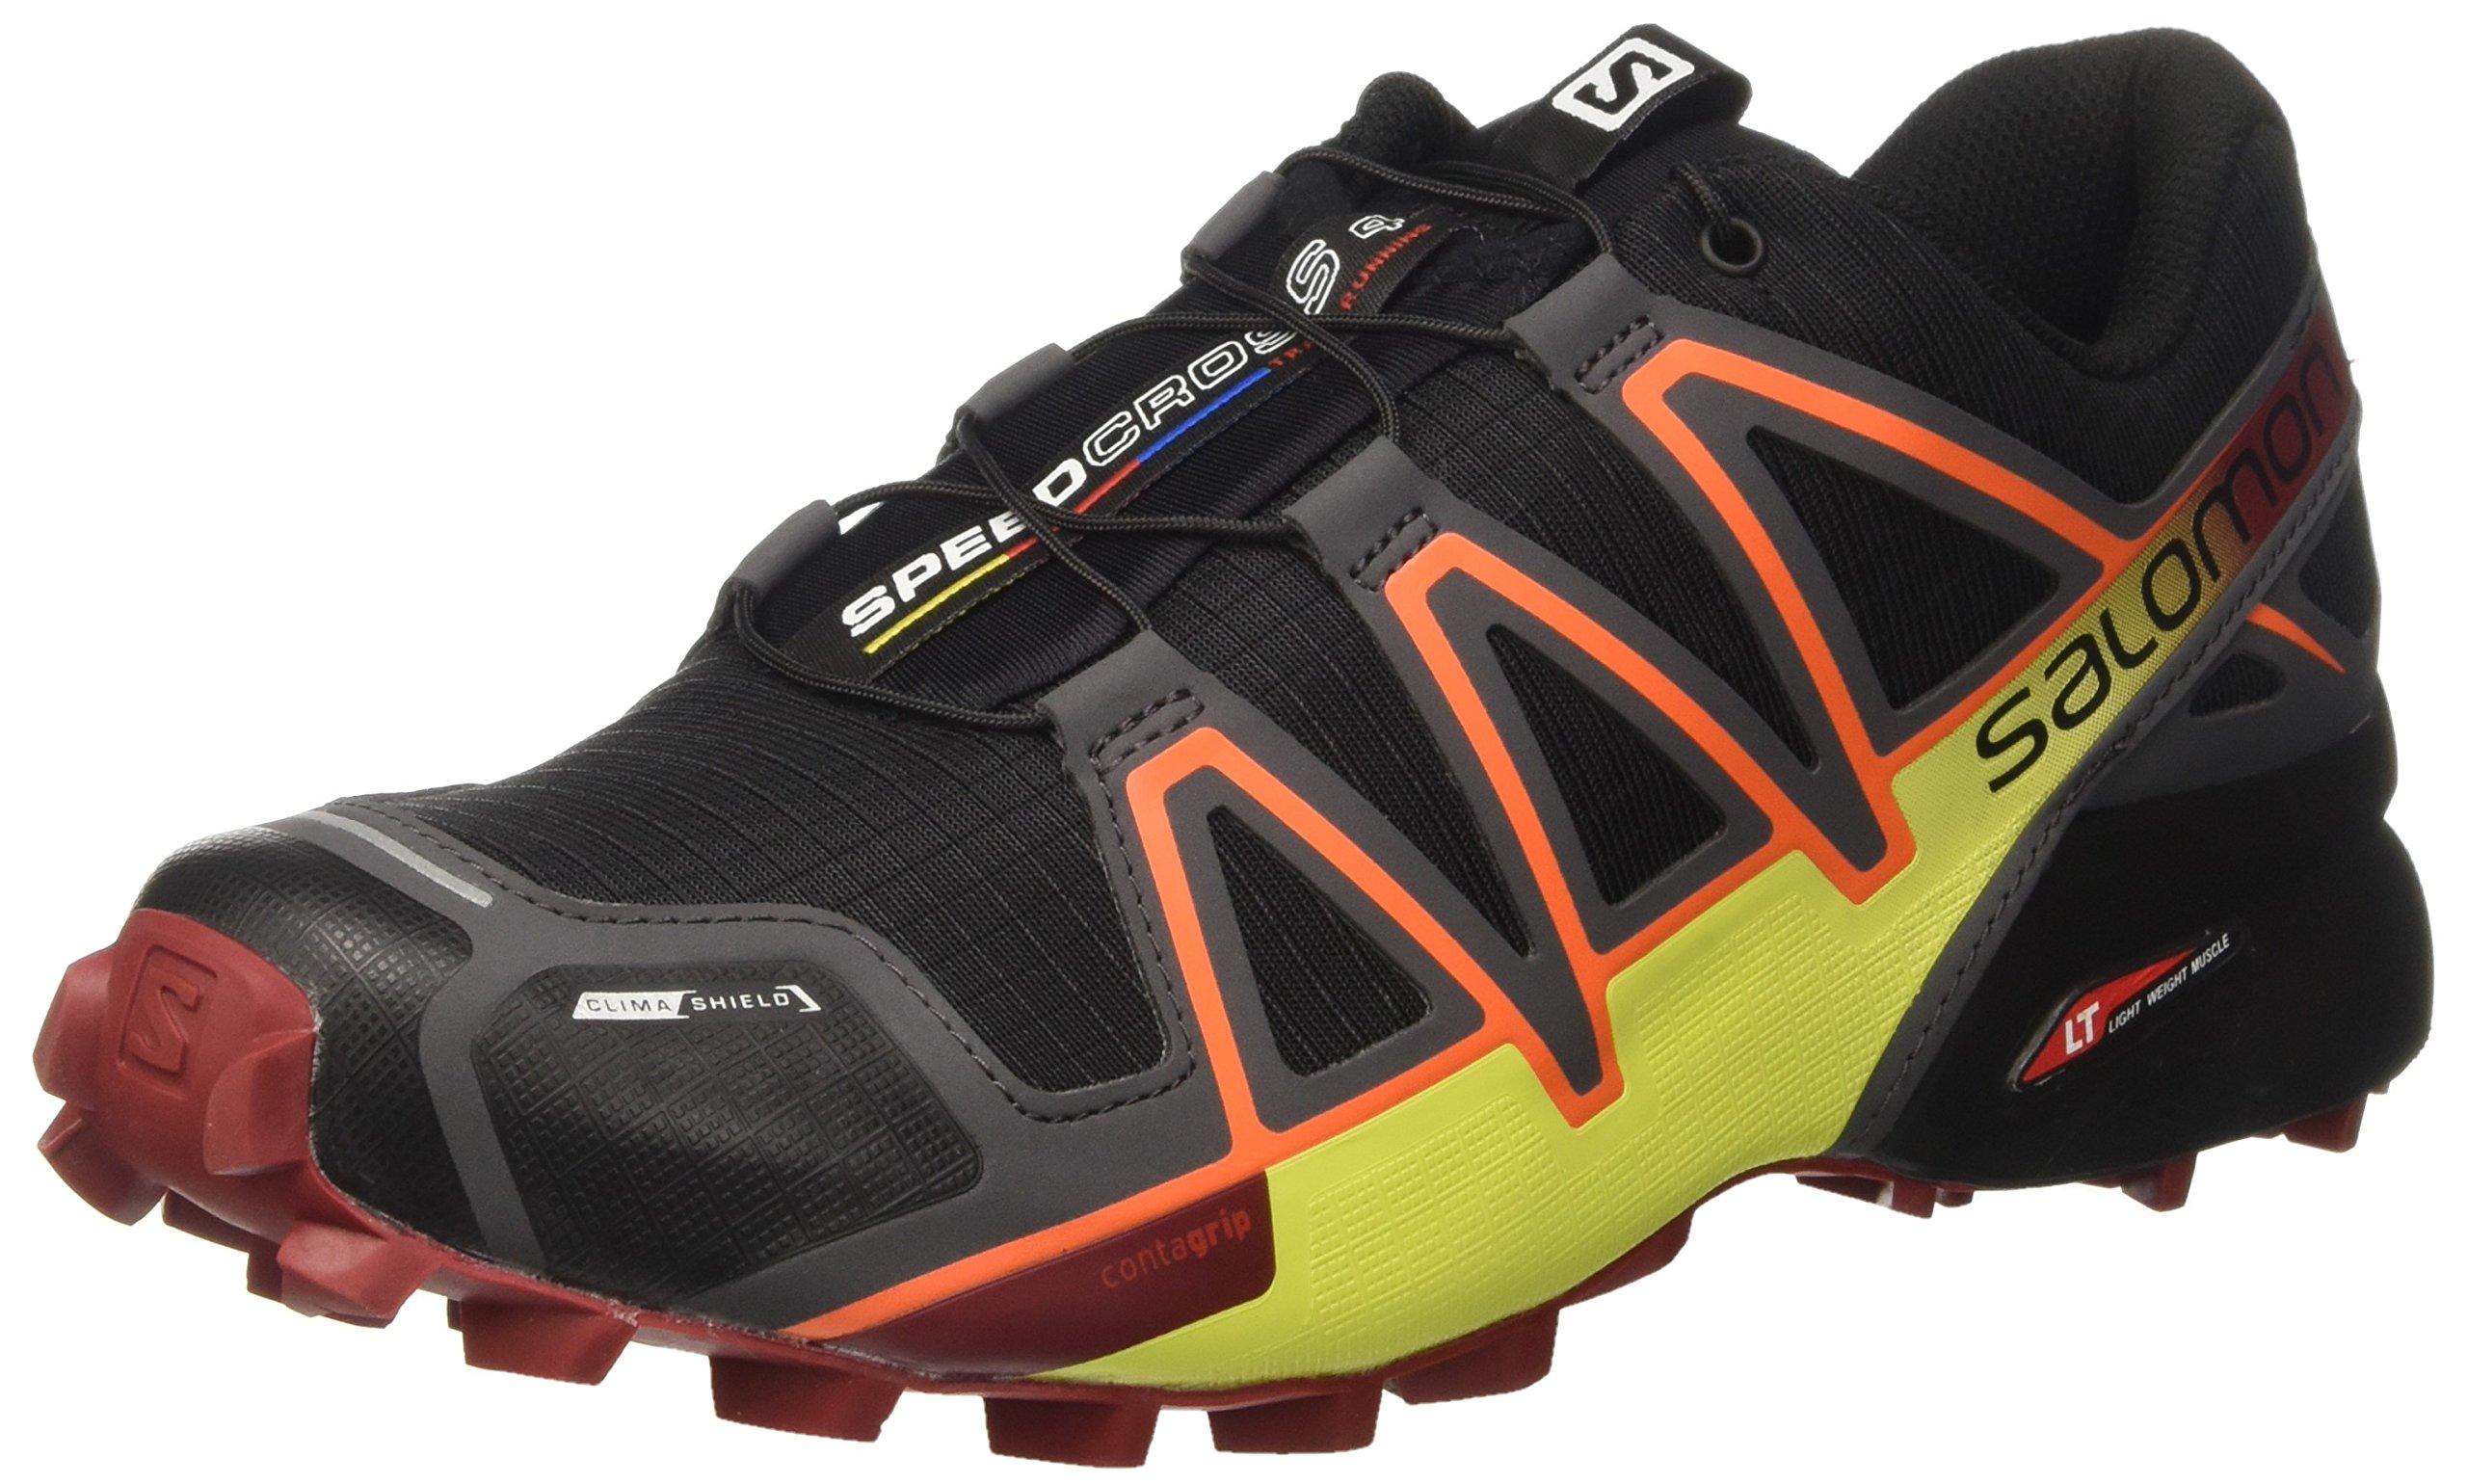 Salomon Men's XA Pro 3D Trail Running Shoes, Black/Magnet/Red Dahlia, 9 D US by Salomon